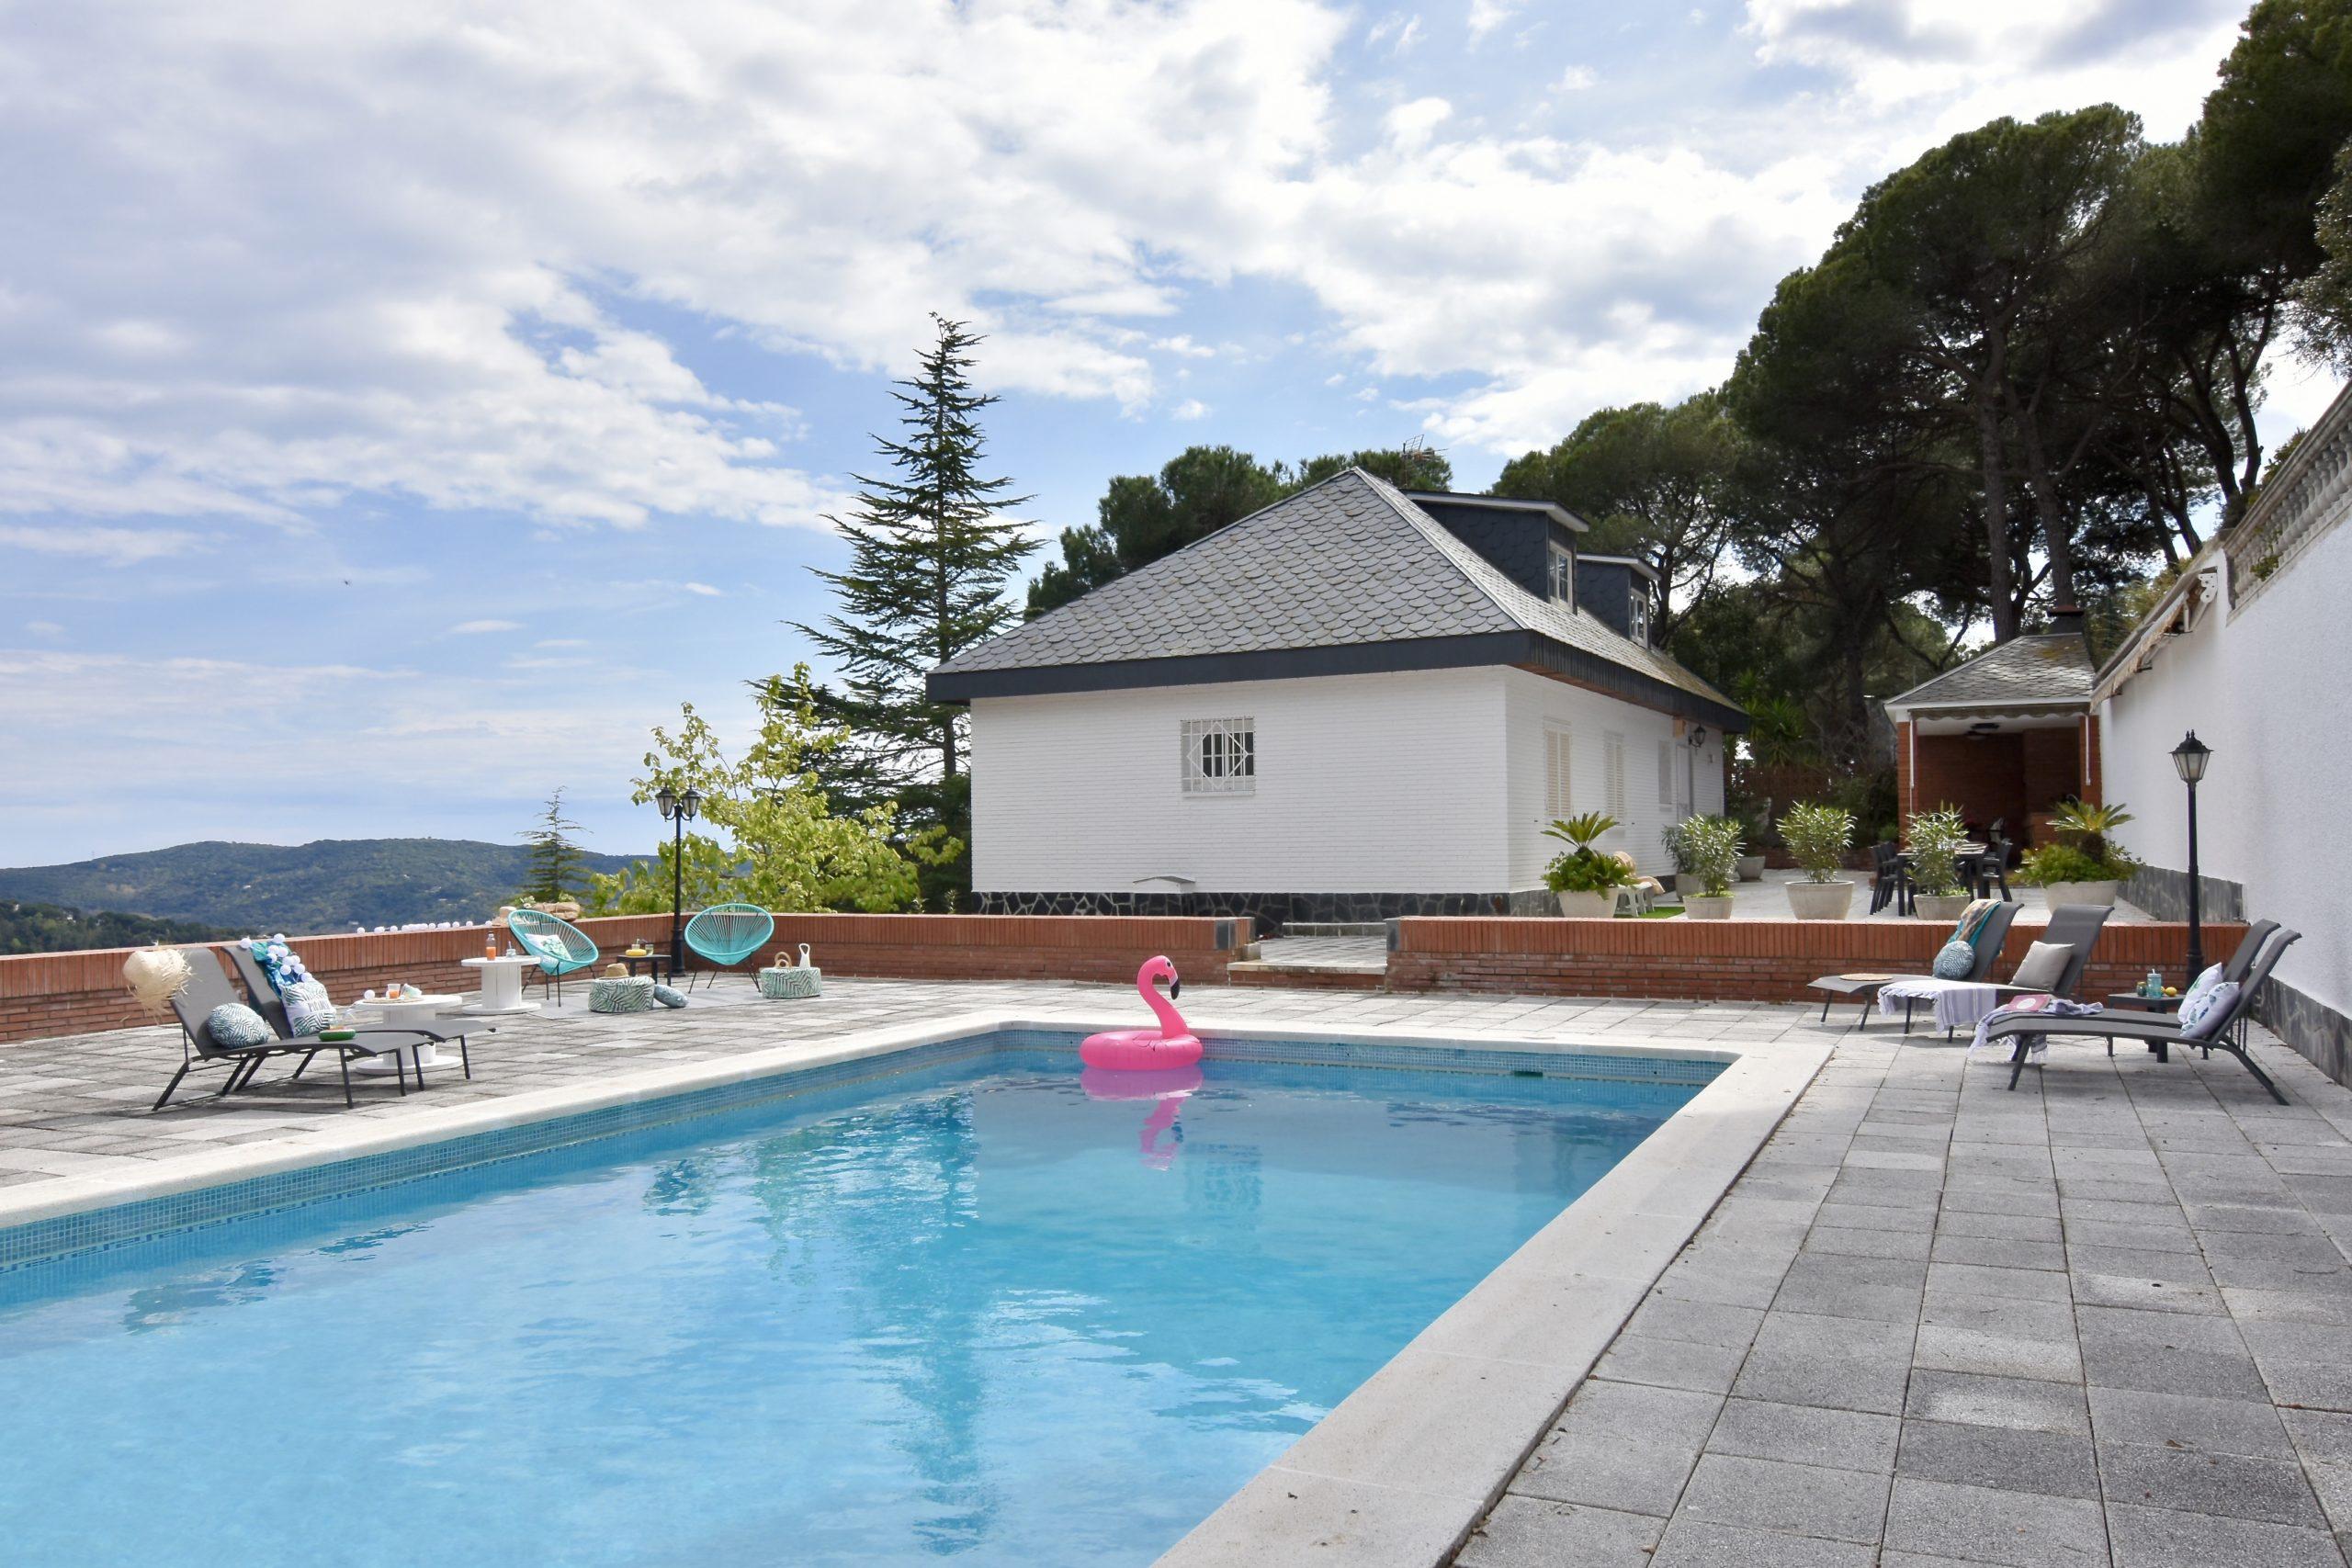 Delaguard_Home_Staging_Alquiler_turistico